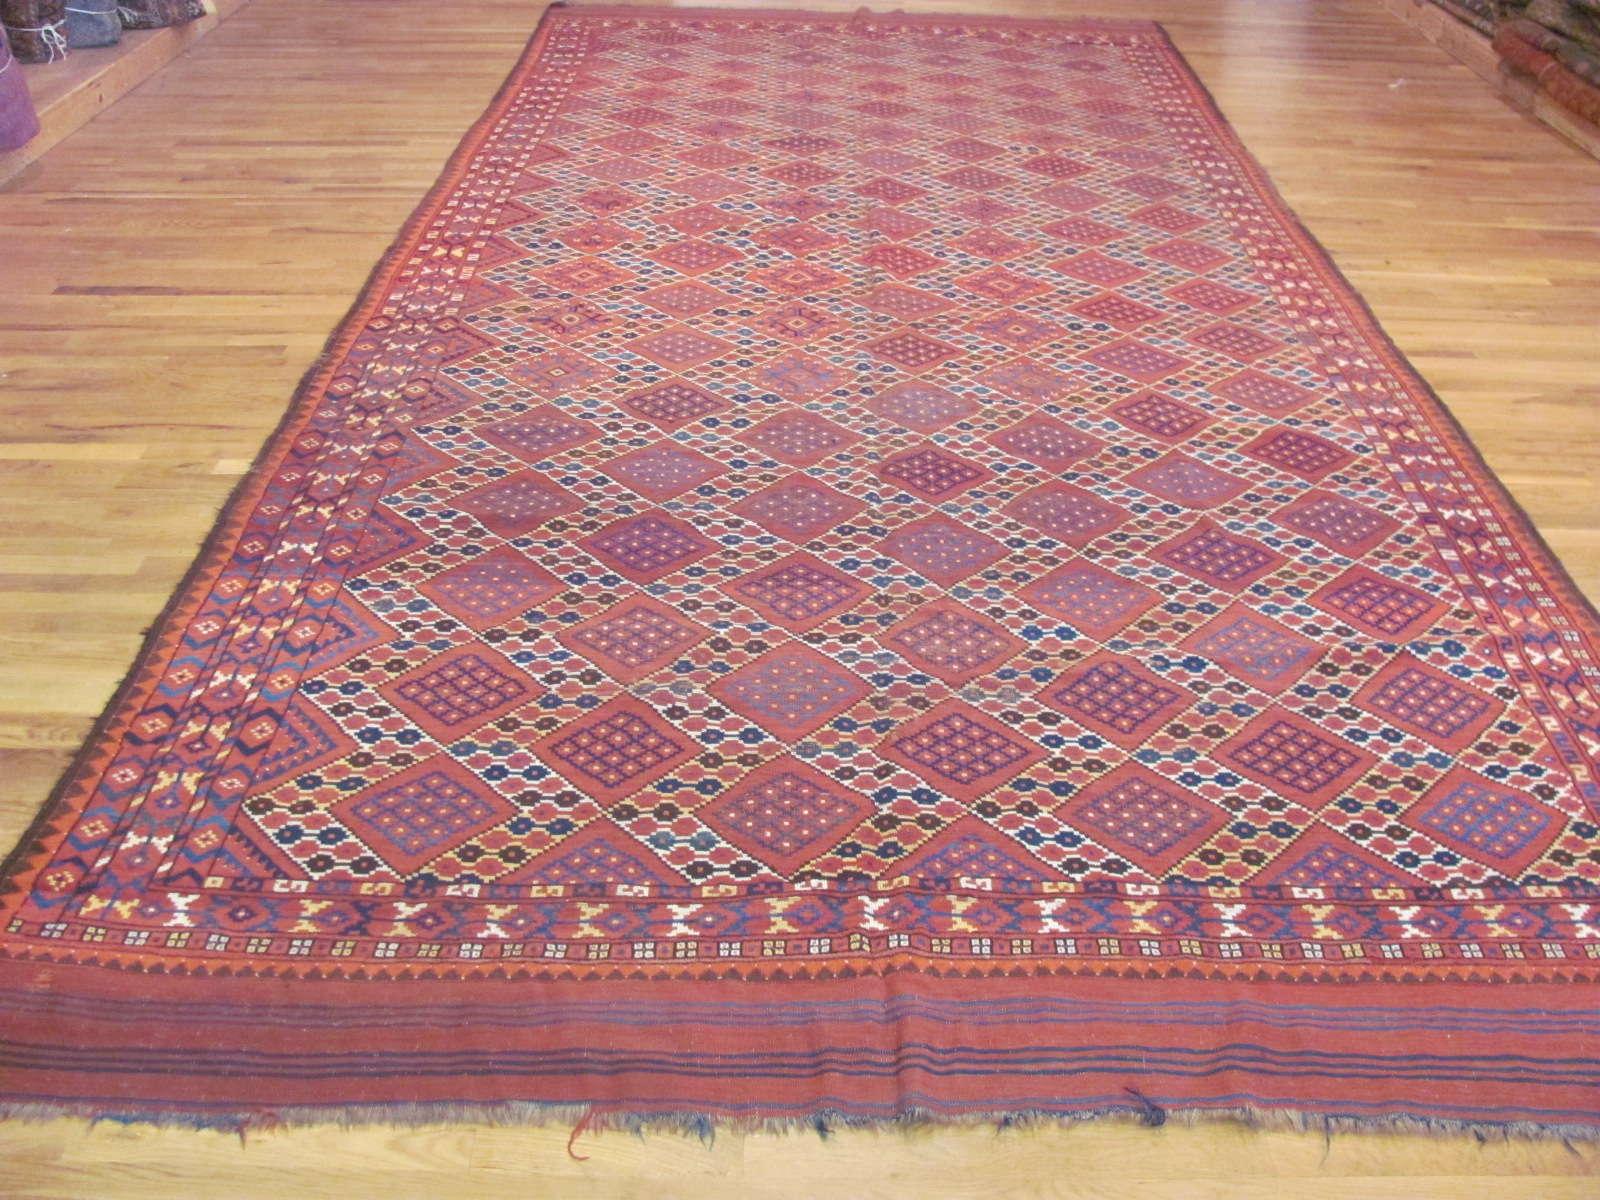 Antique Beshir Carpet   Circa 1900